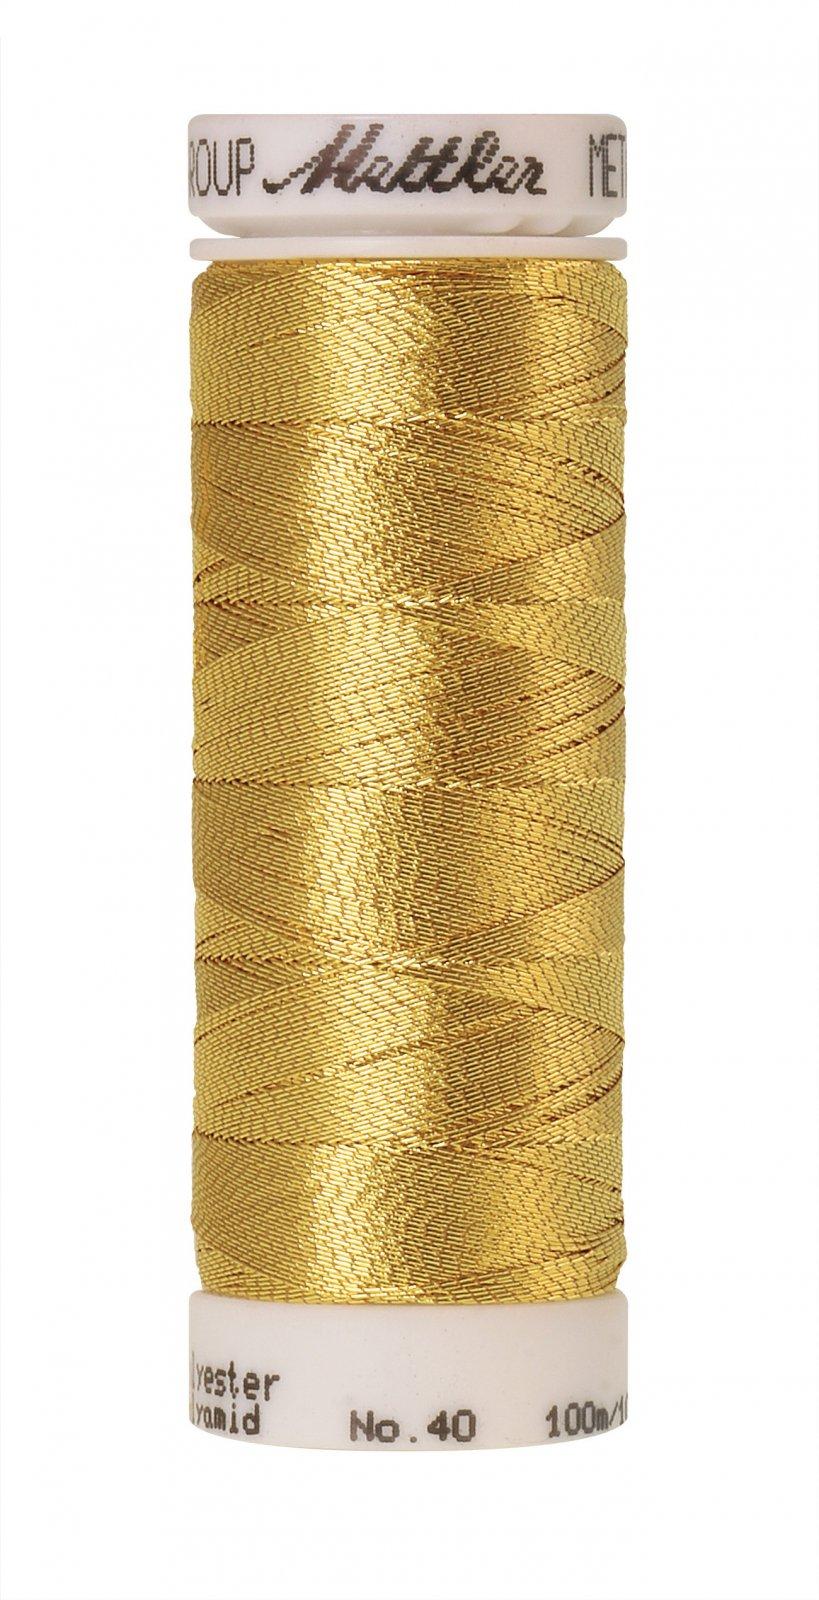 Polyester/Nylon Metallic Embroidery Thread 40wt 300d 100M/110yds Gold